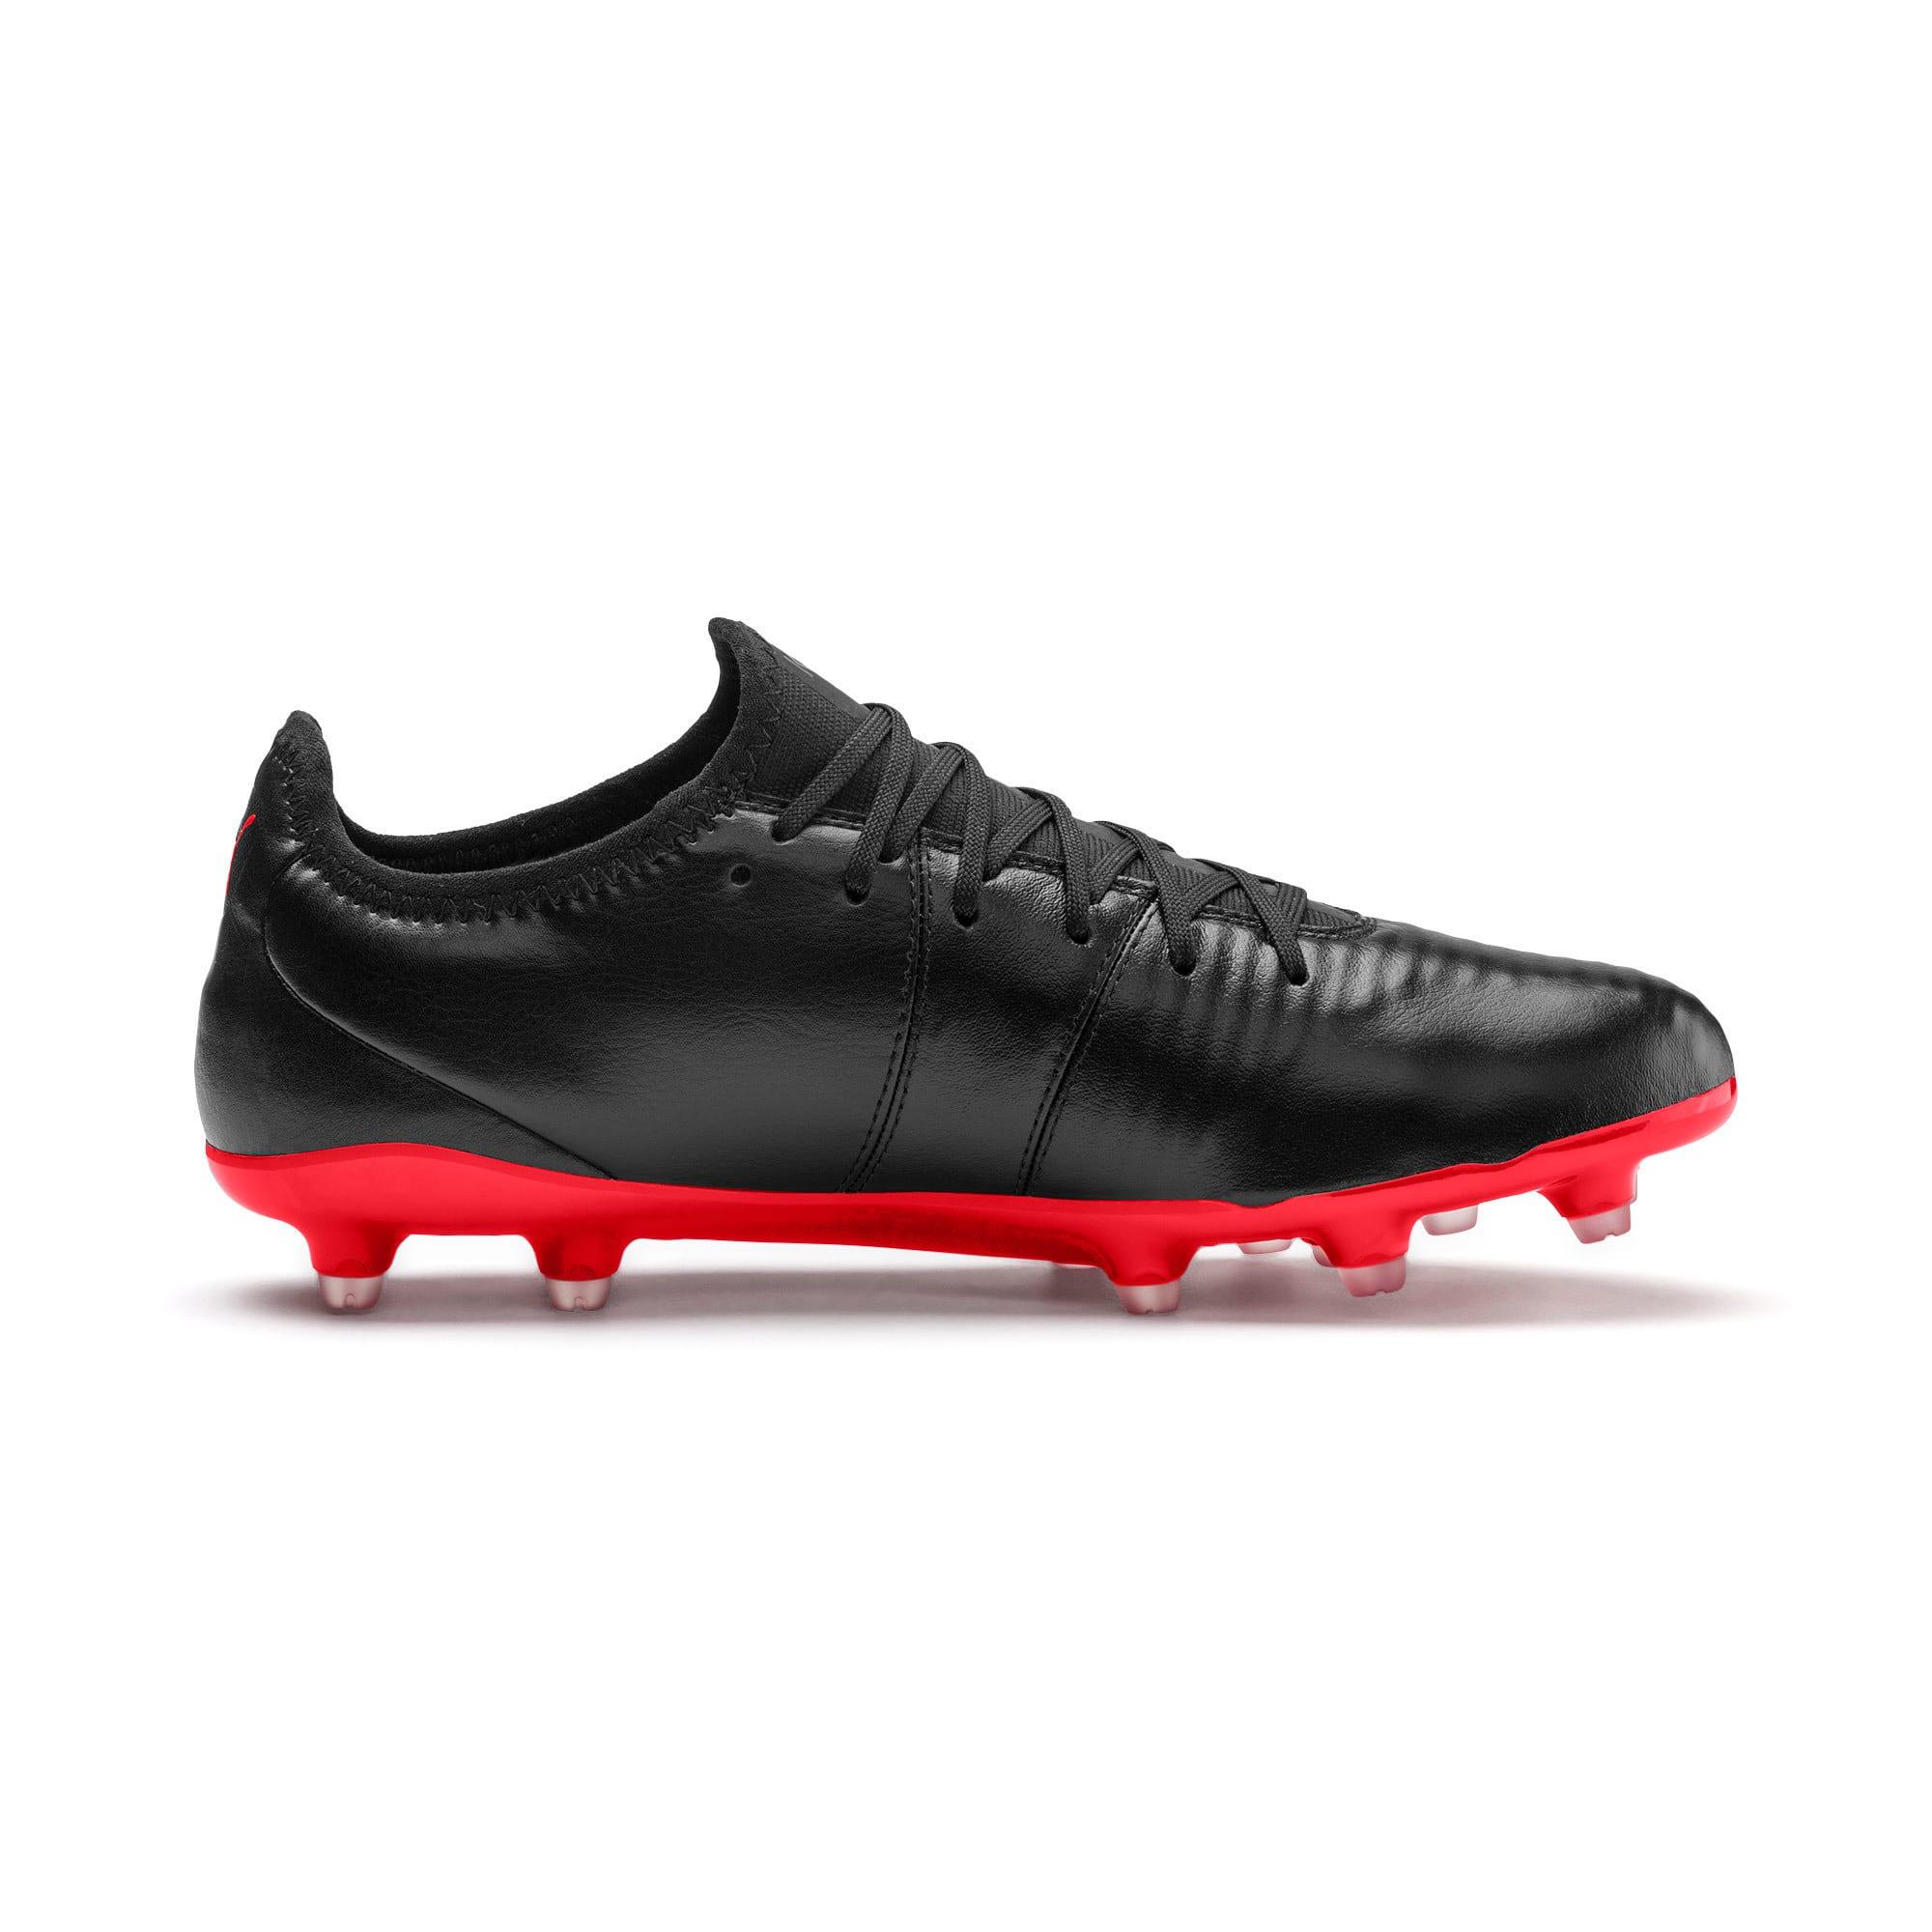 Thumbnail 6 of King Pro FG Soccer Cleats, Puma Black-High Risk Red, medium